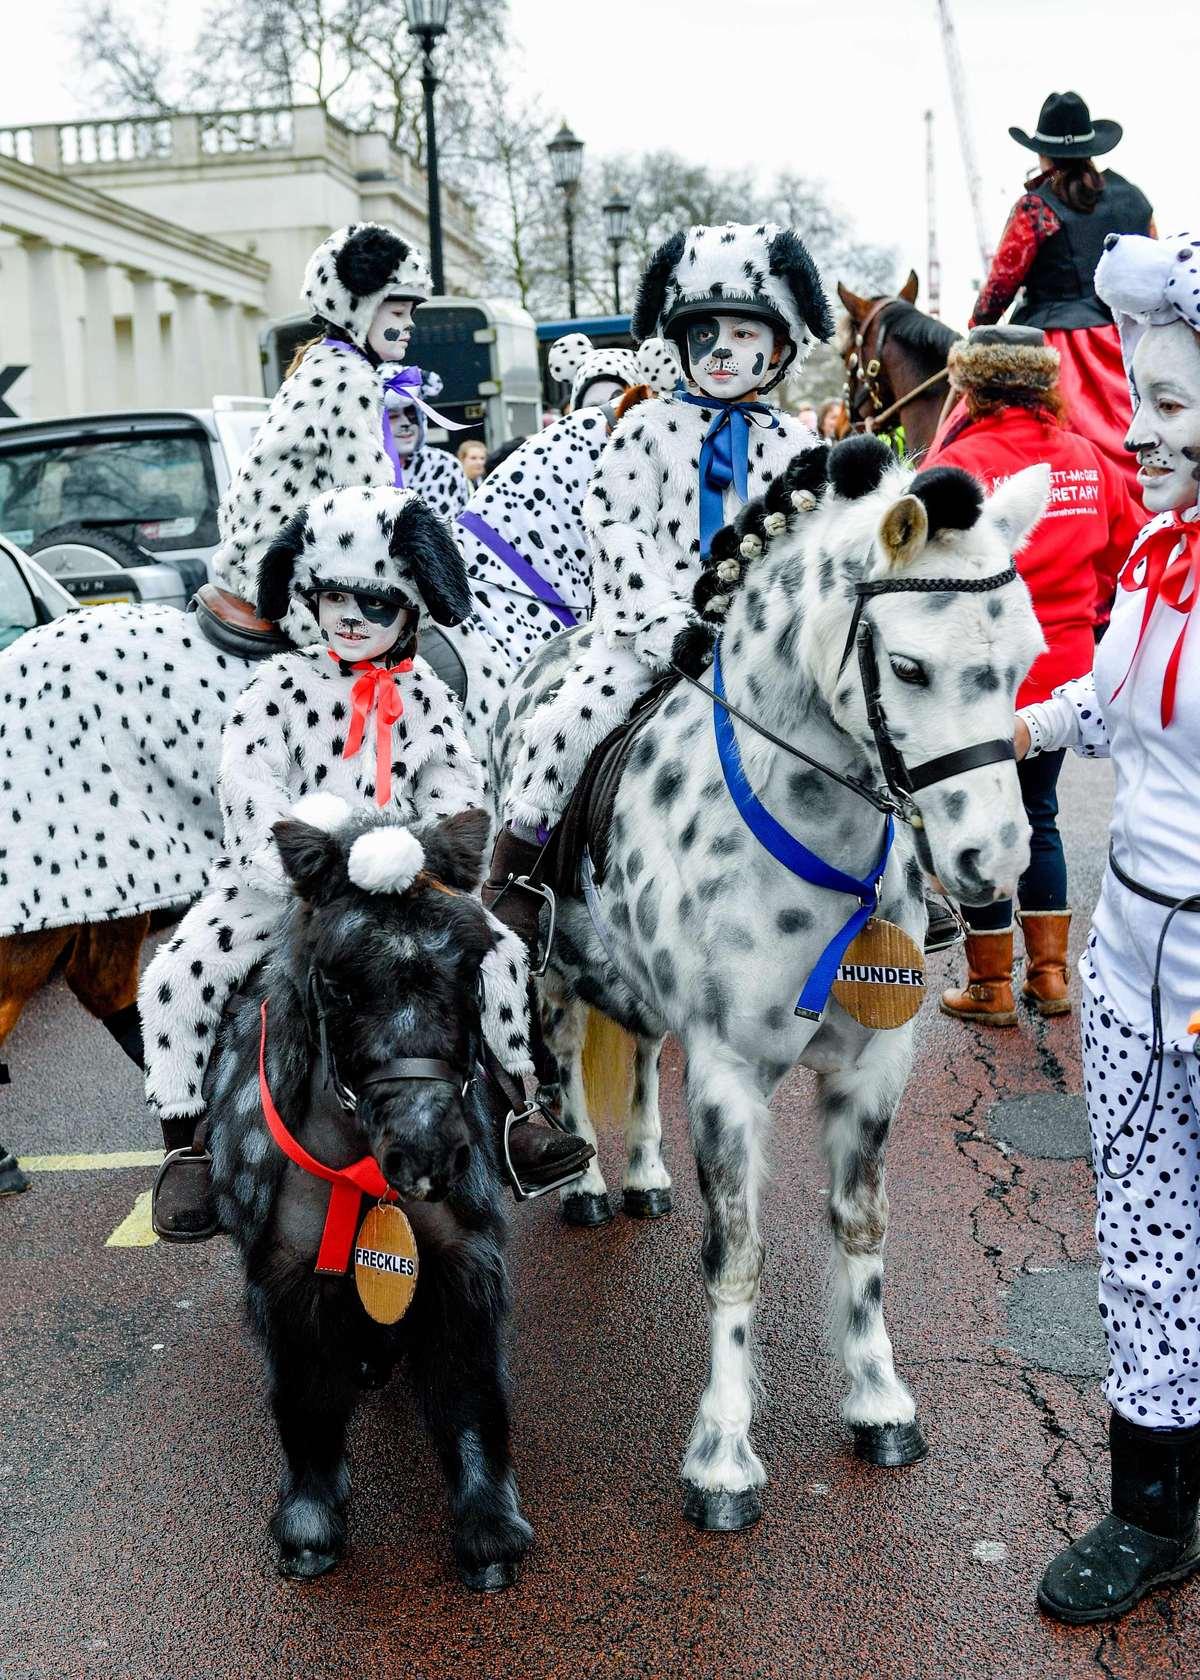 101 Dalmatians New Year's Day Parade London